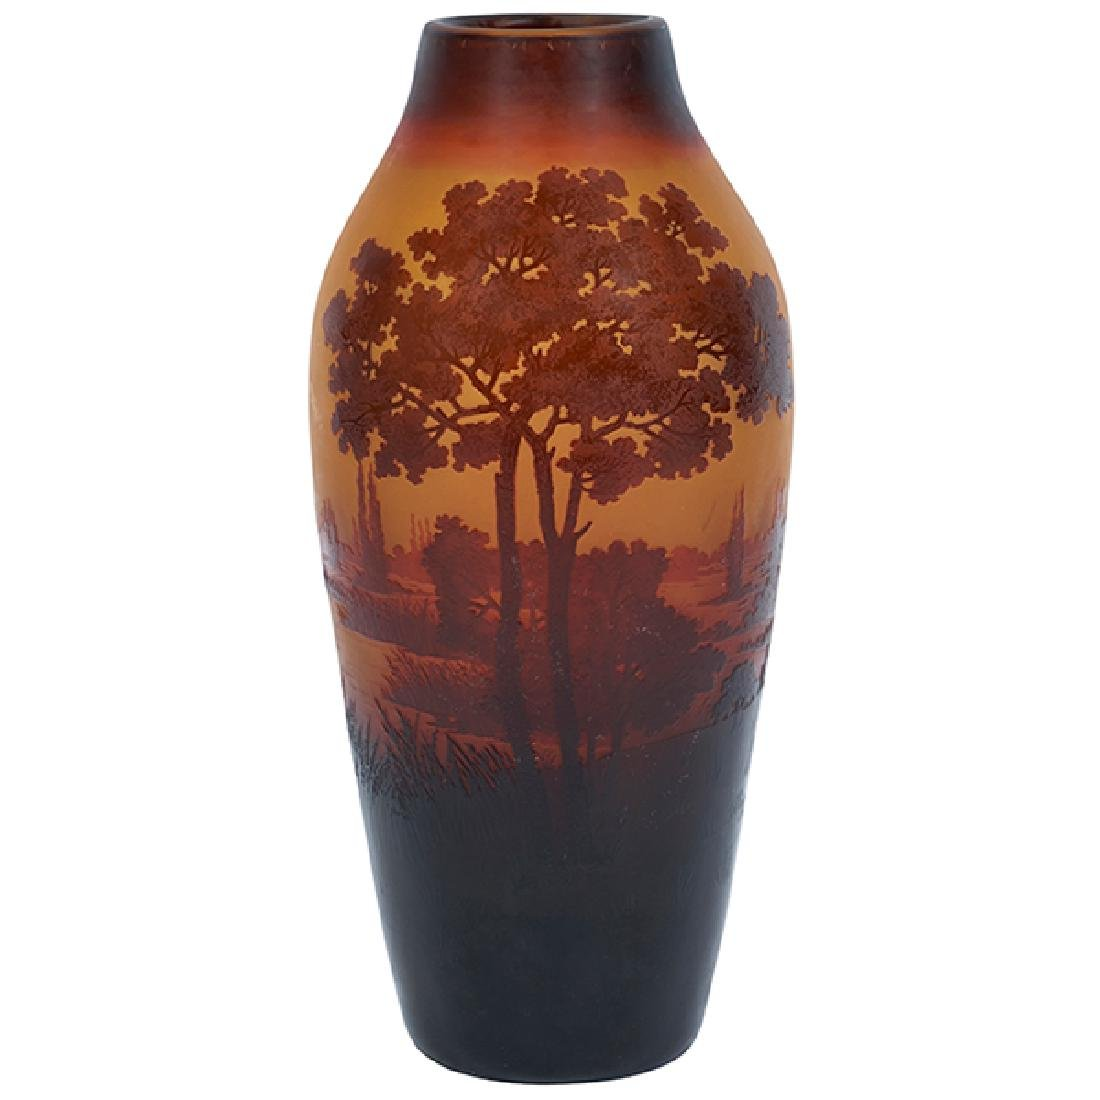 "D'Argental Landscape vase 4.5""dia x 9.5""h"